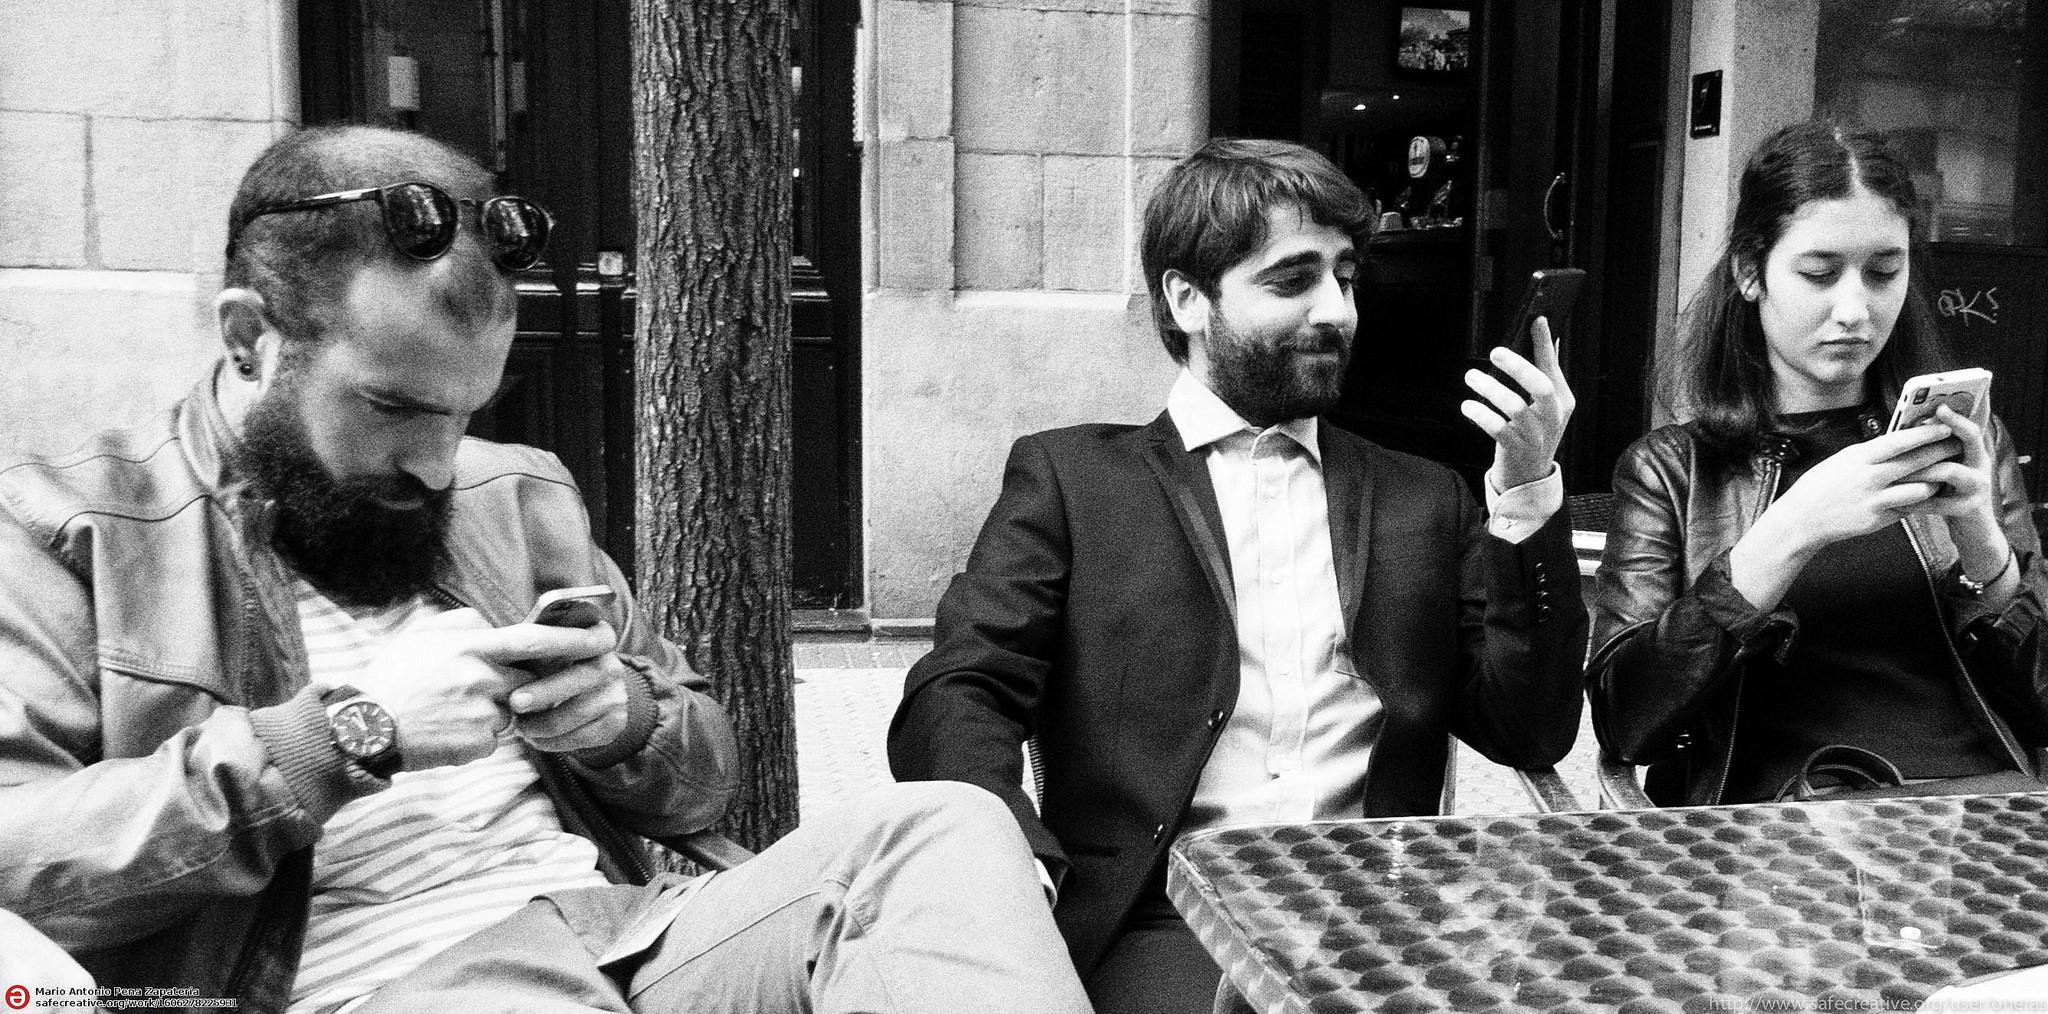 Smartphone_1_Mario_Antonio_Pena_Zapateria.jpg